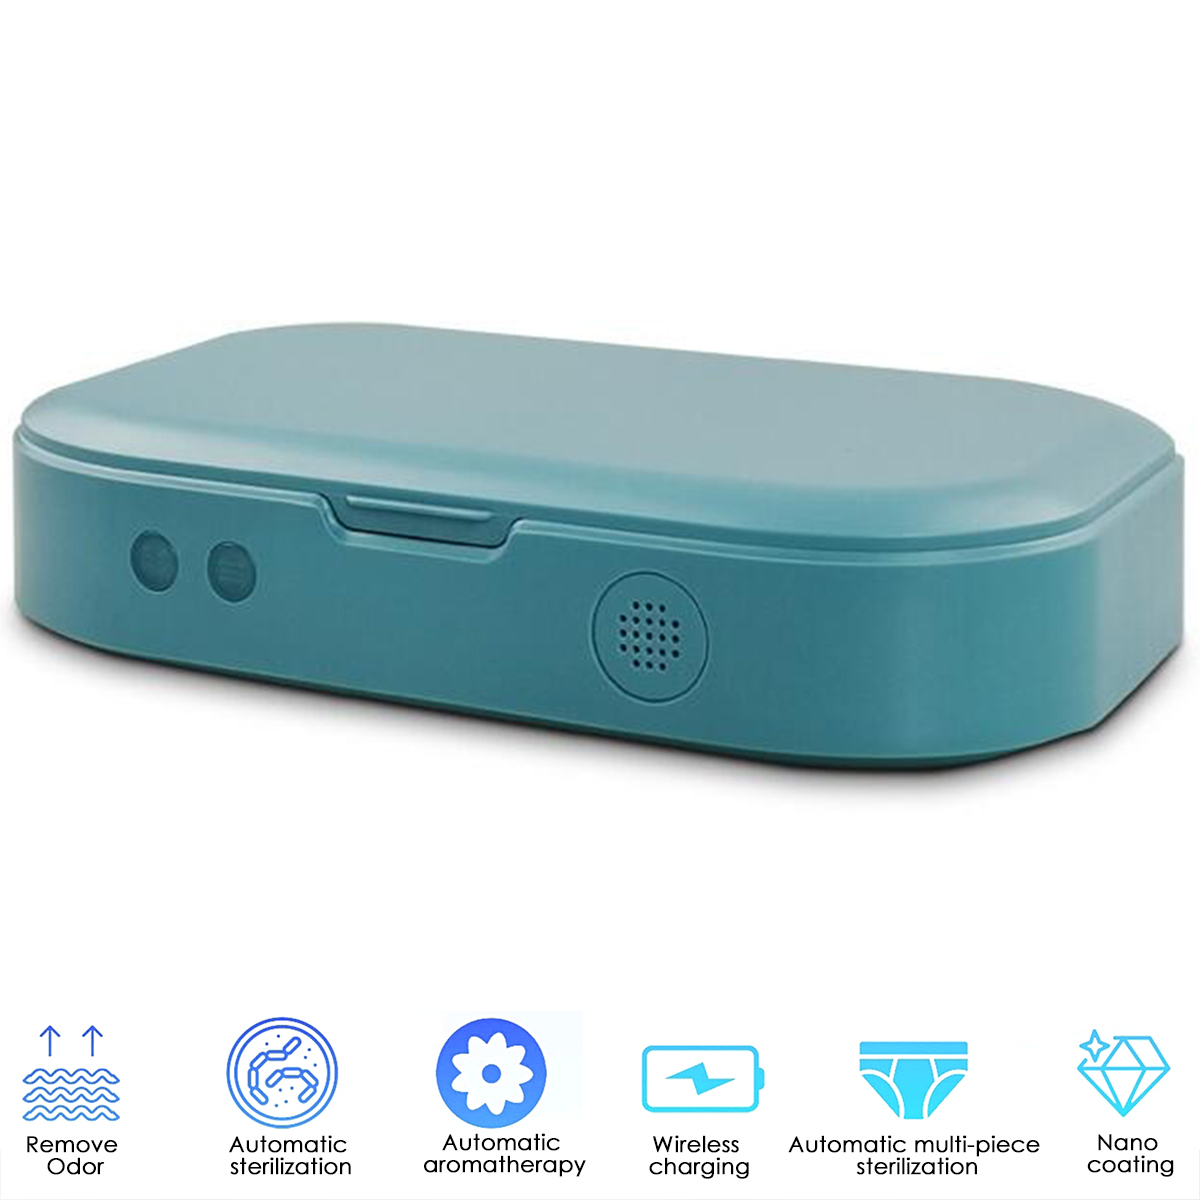 Multi-function Plastic UV Sterilizer Case Box Blue Portable for Mask Mobile Phone Watch blue